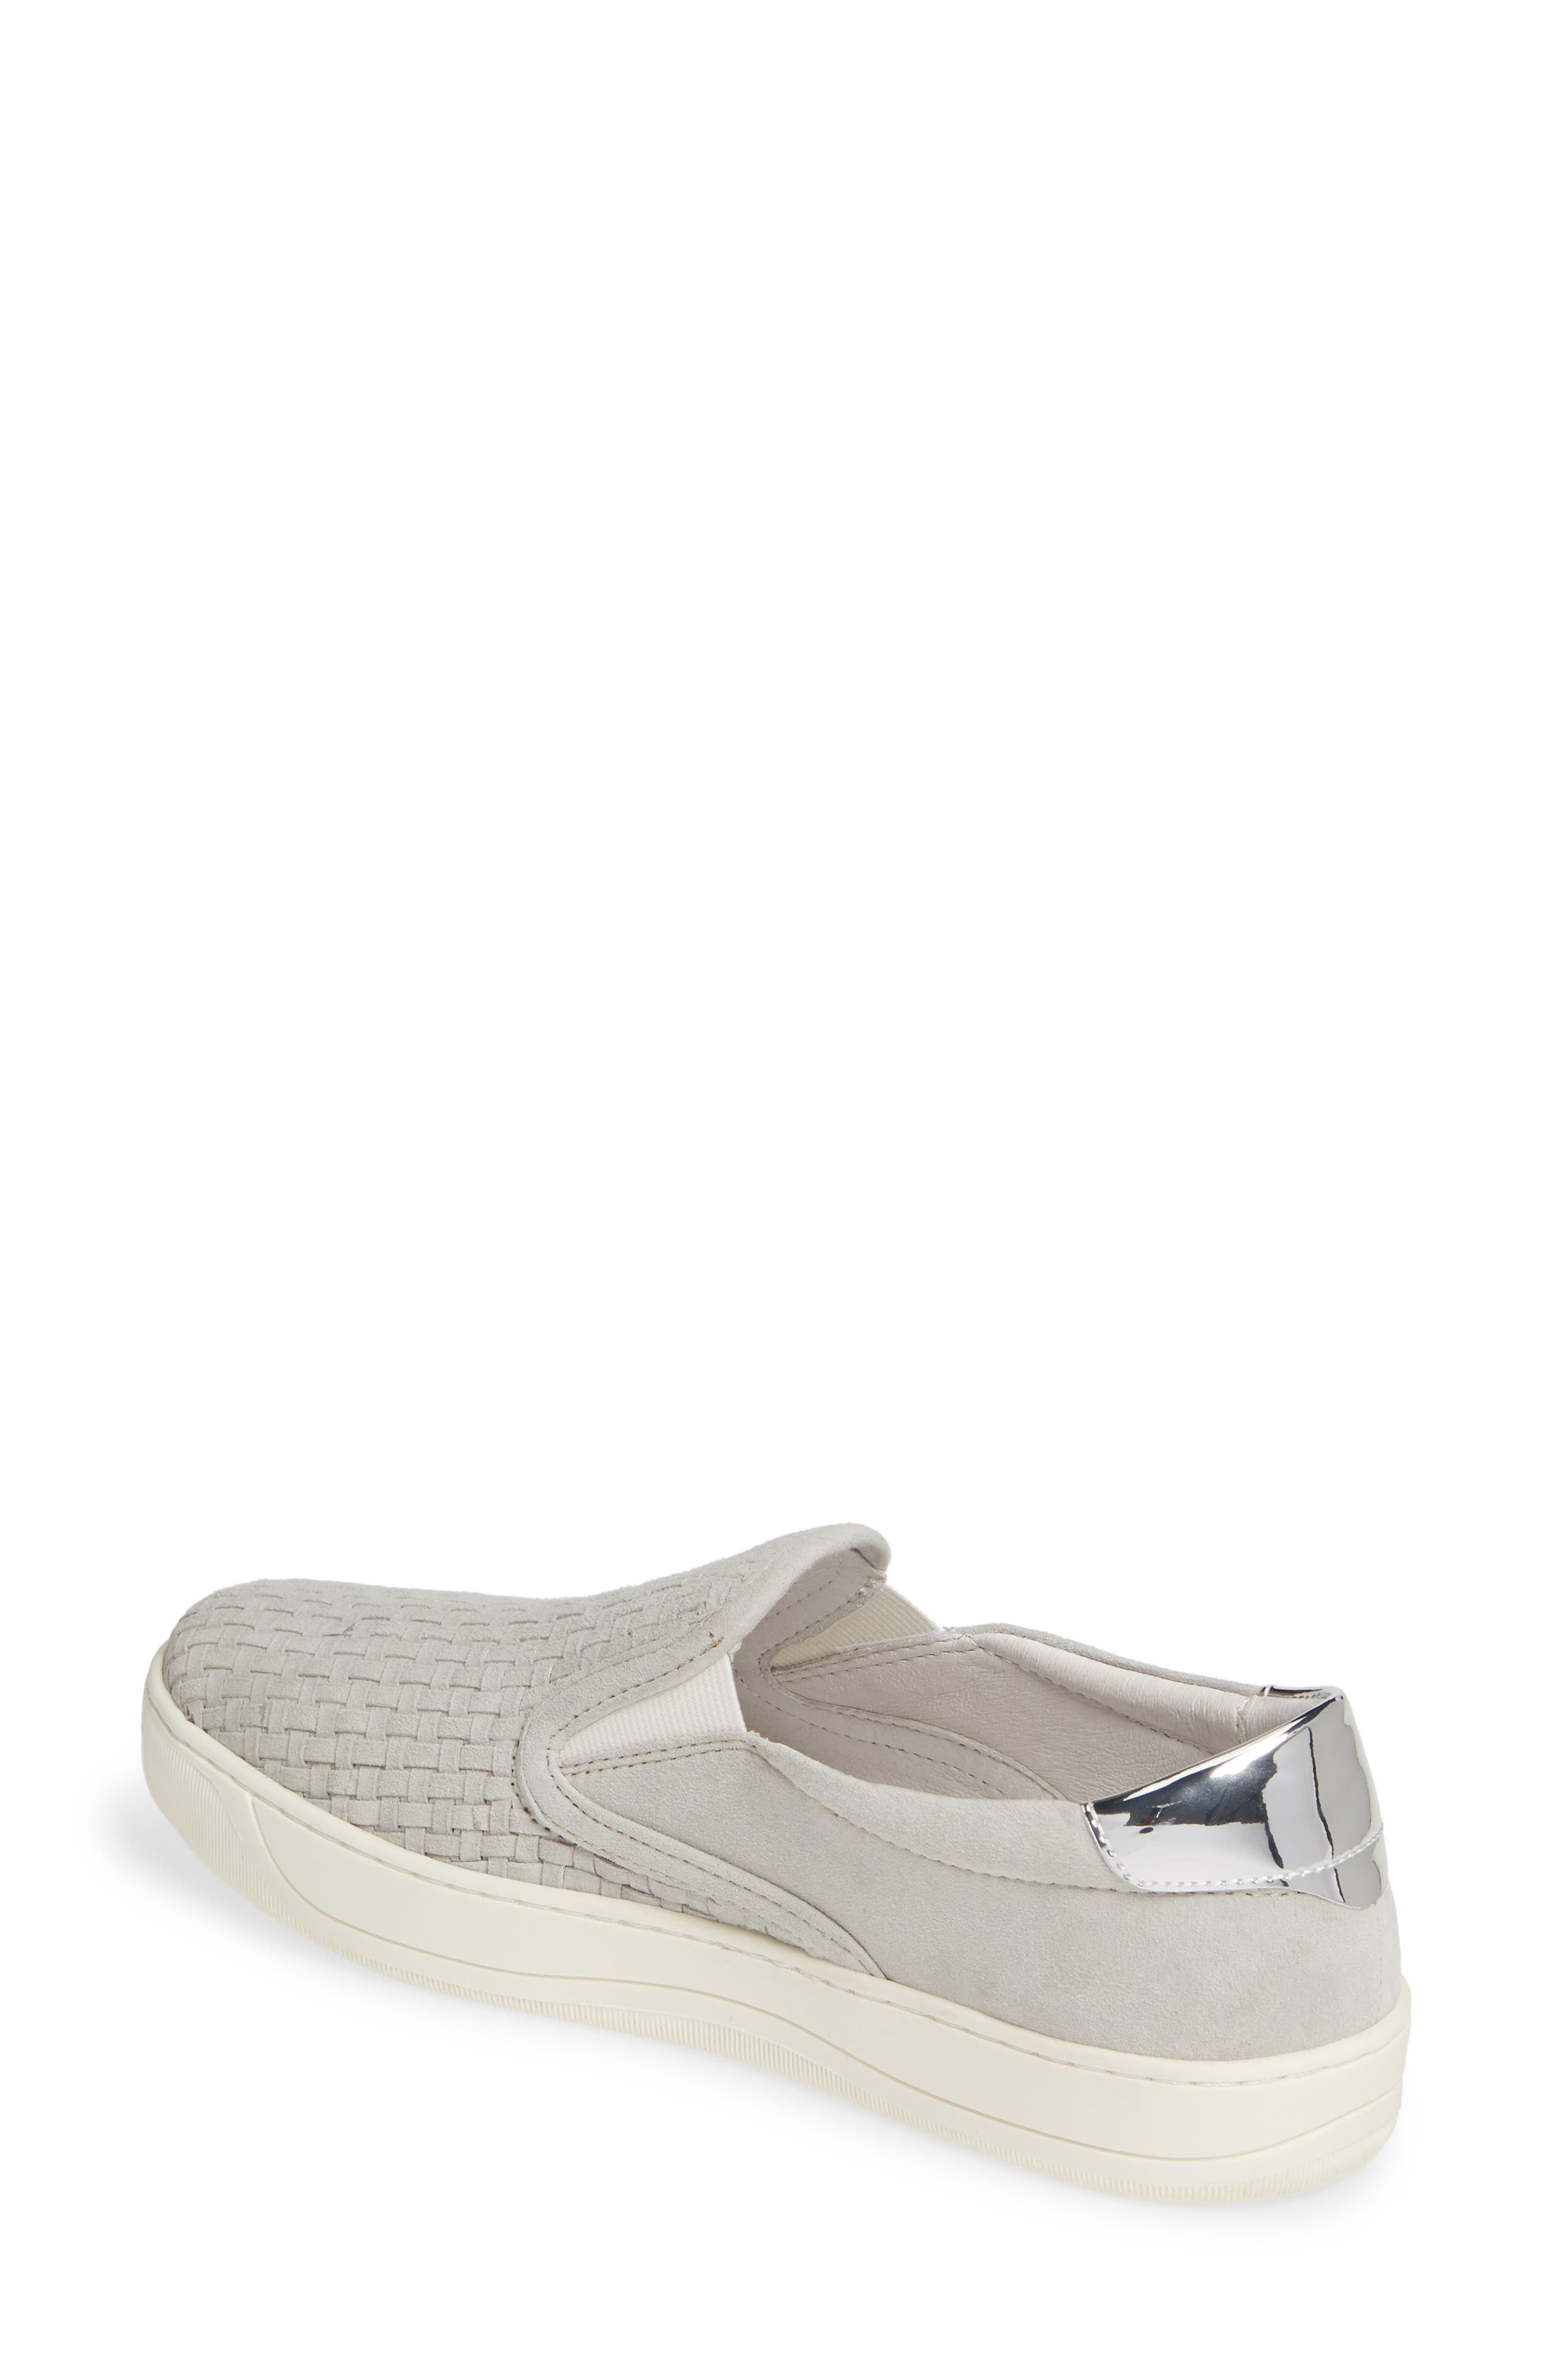 Elaine Woven Slip-On Sneaker,                             Alternate thumbnail 2, color,                             GREY SUEDE